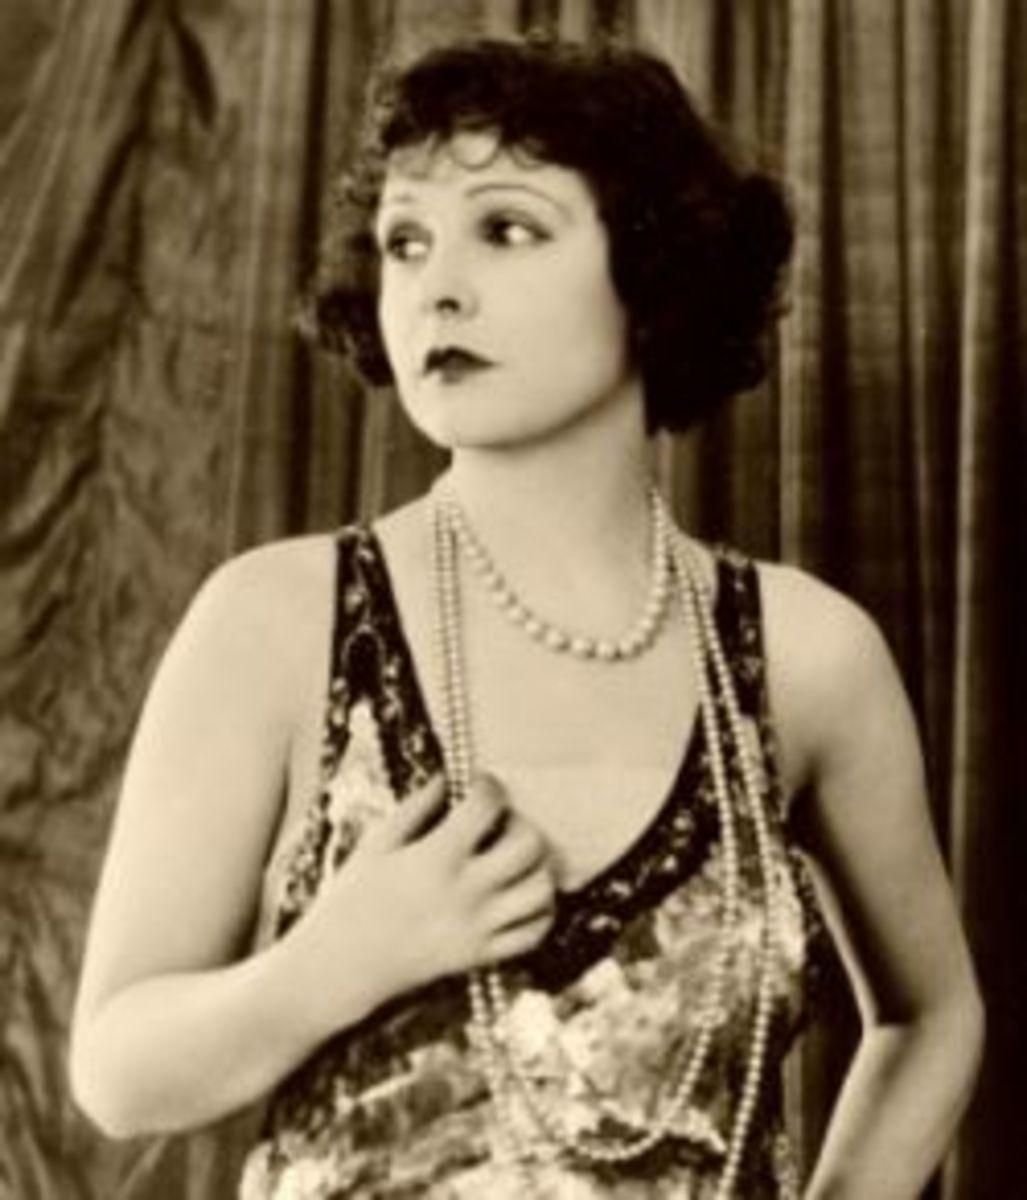 Silent film star Norma Talmadge - by Bain News Service [Public domain], via Wikimedia Commons